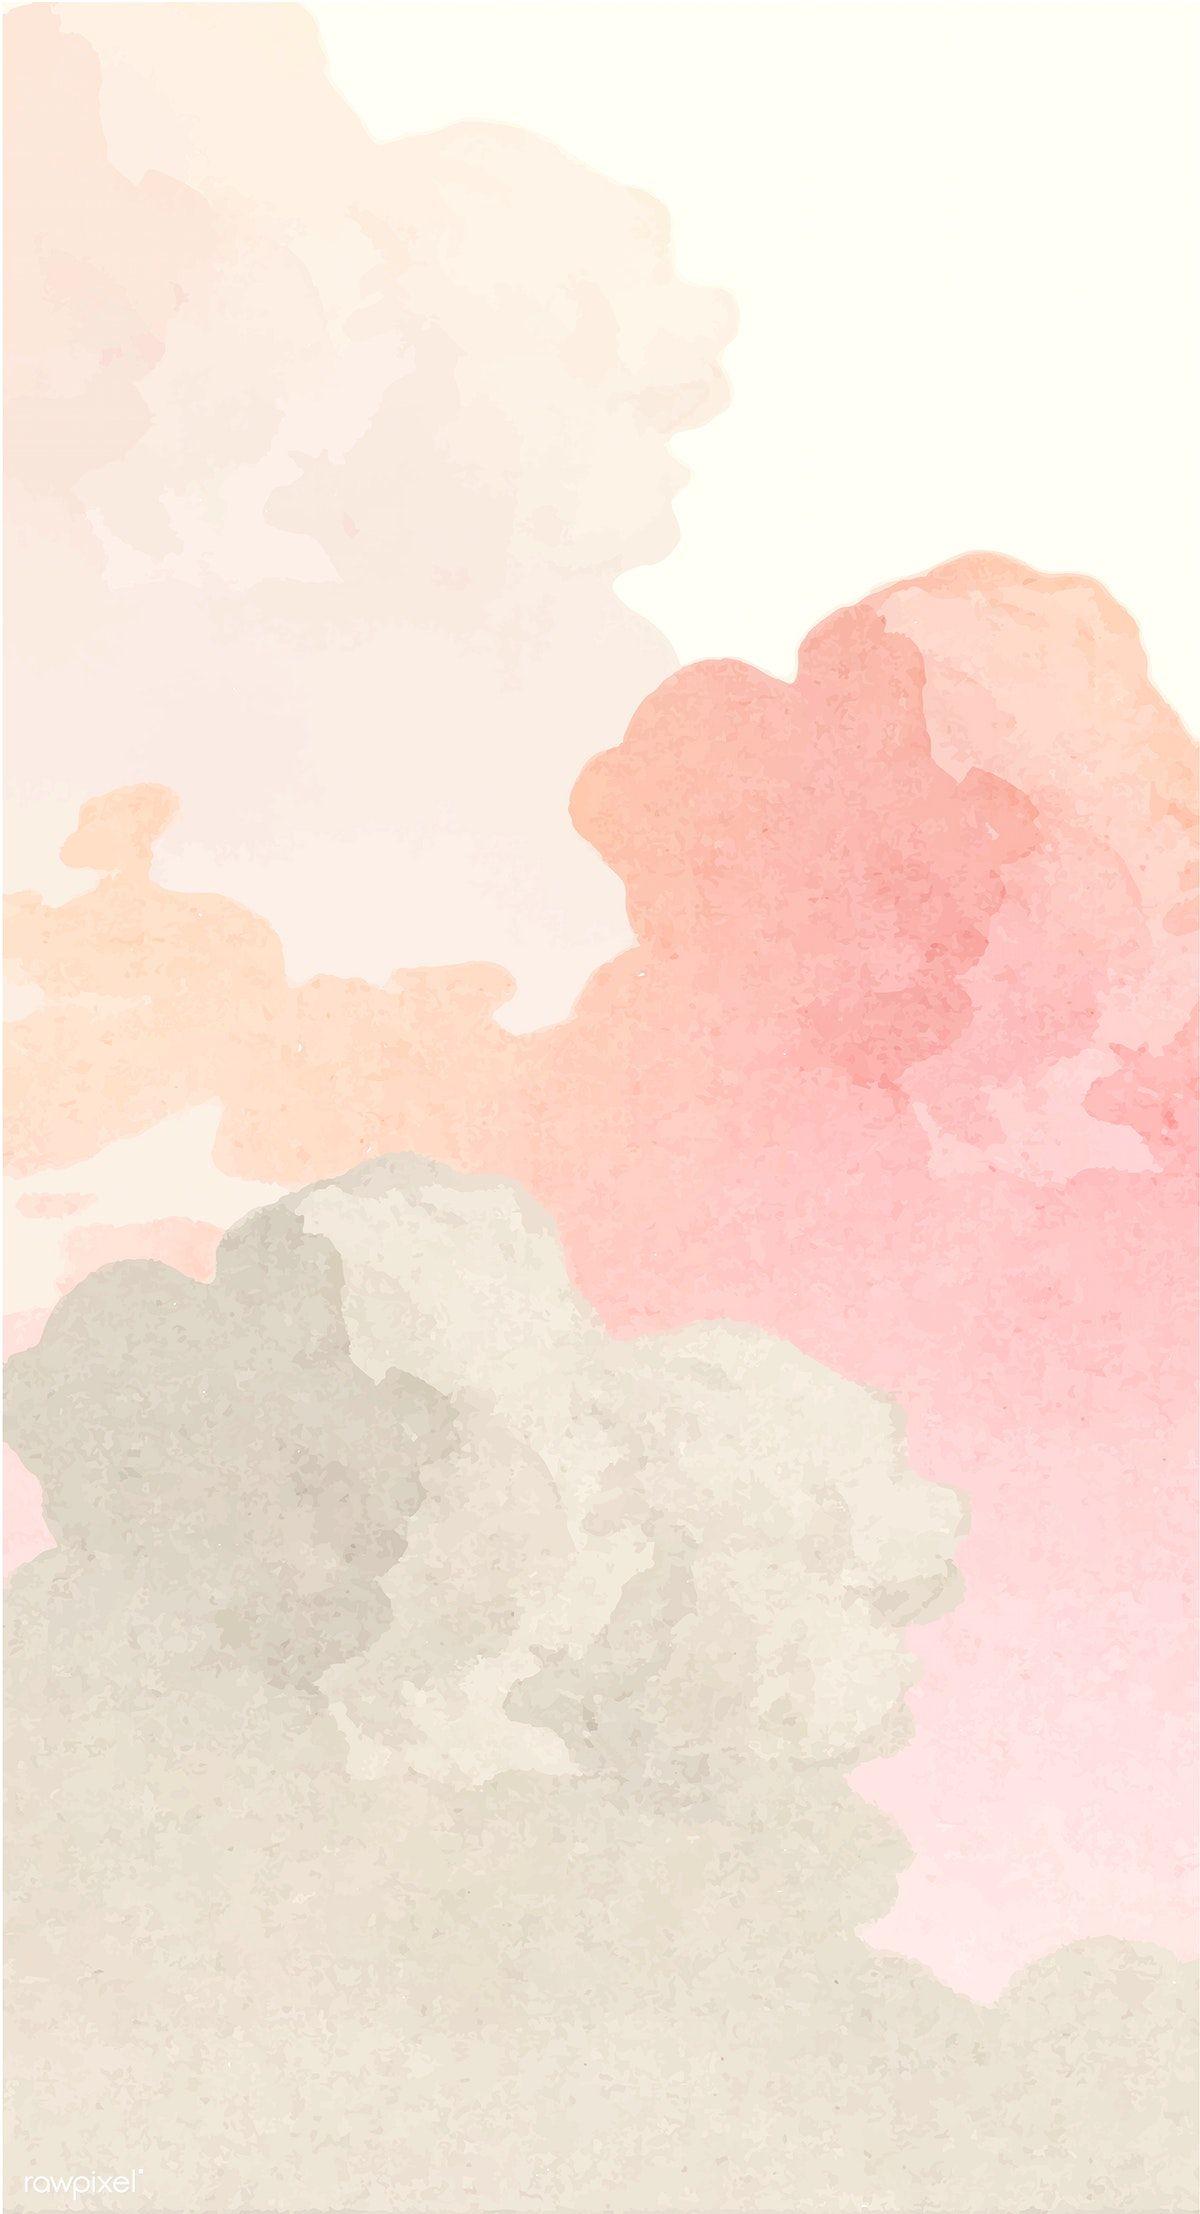 Download premium vector of Vintage cloud illustration vector 2203206